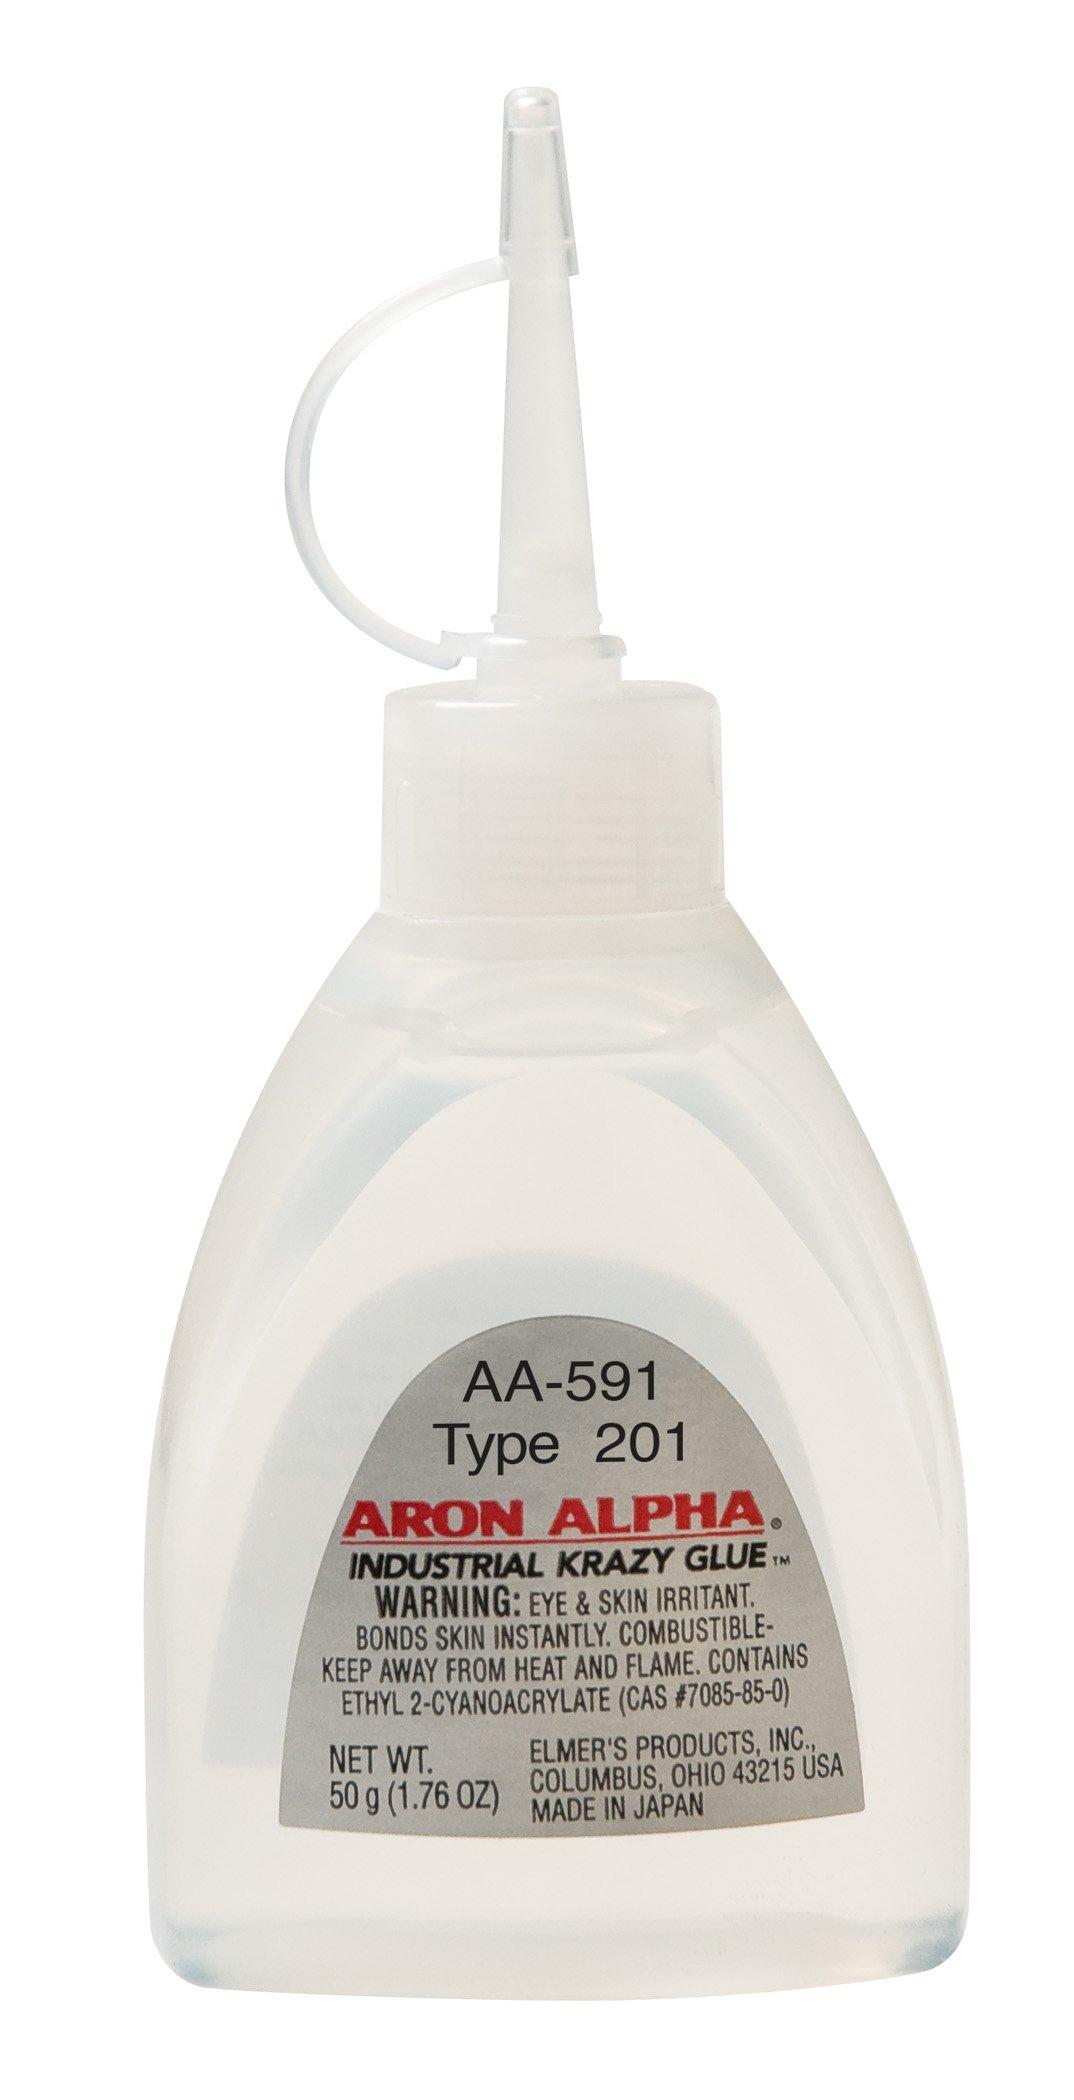 Aron Alpha Type 201 (2 cps viscosity) Regular Set Instant Adhesive 50 g (1.76 oz) Bottle